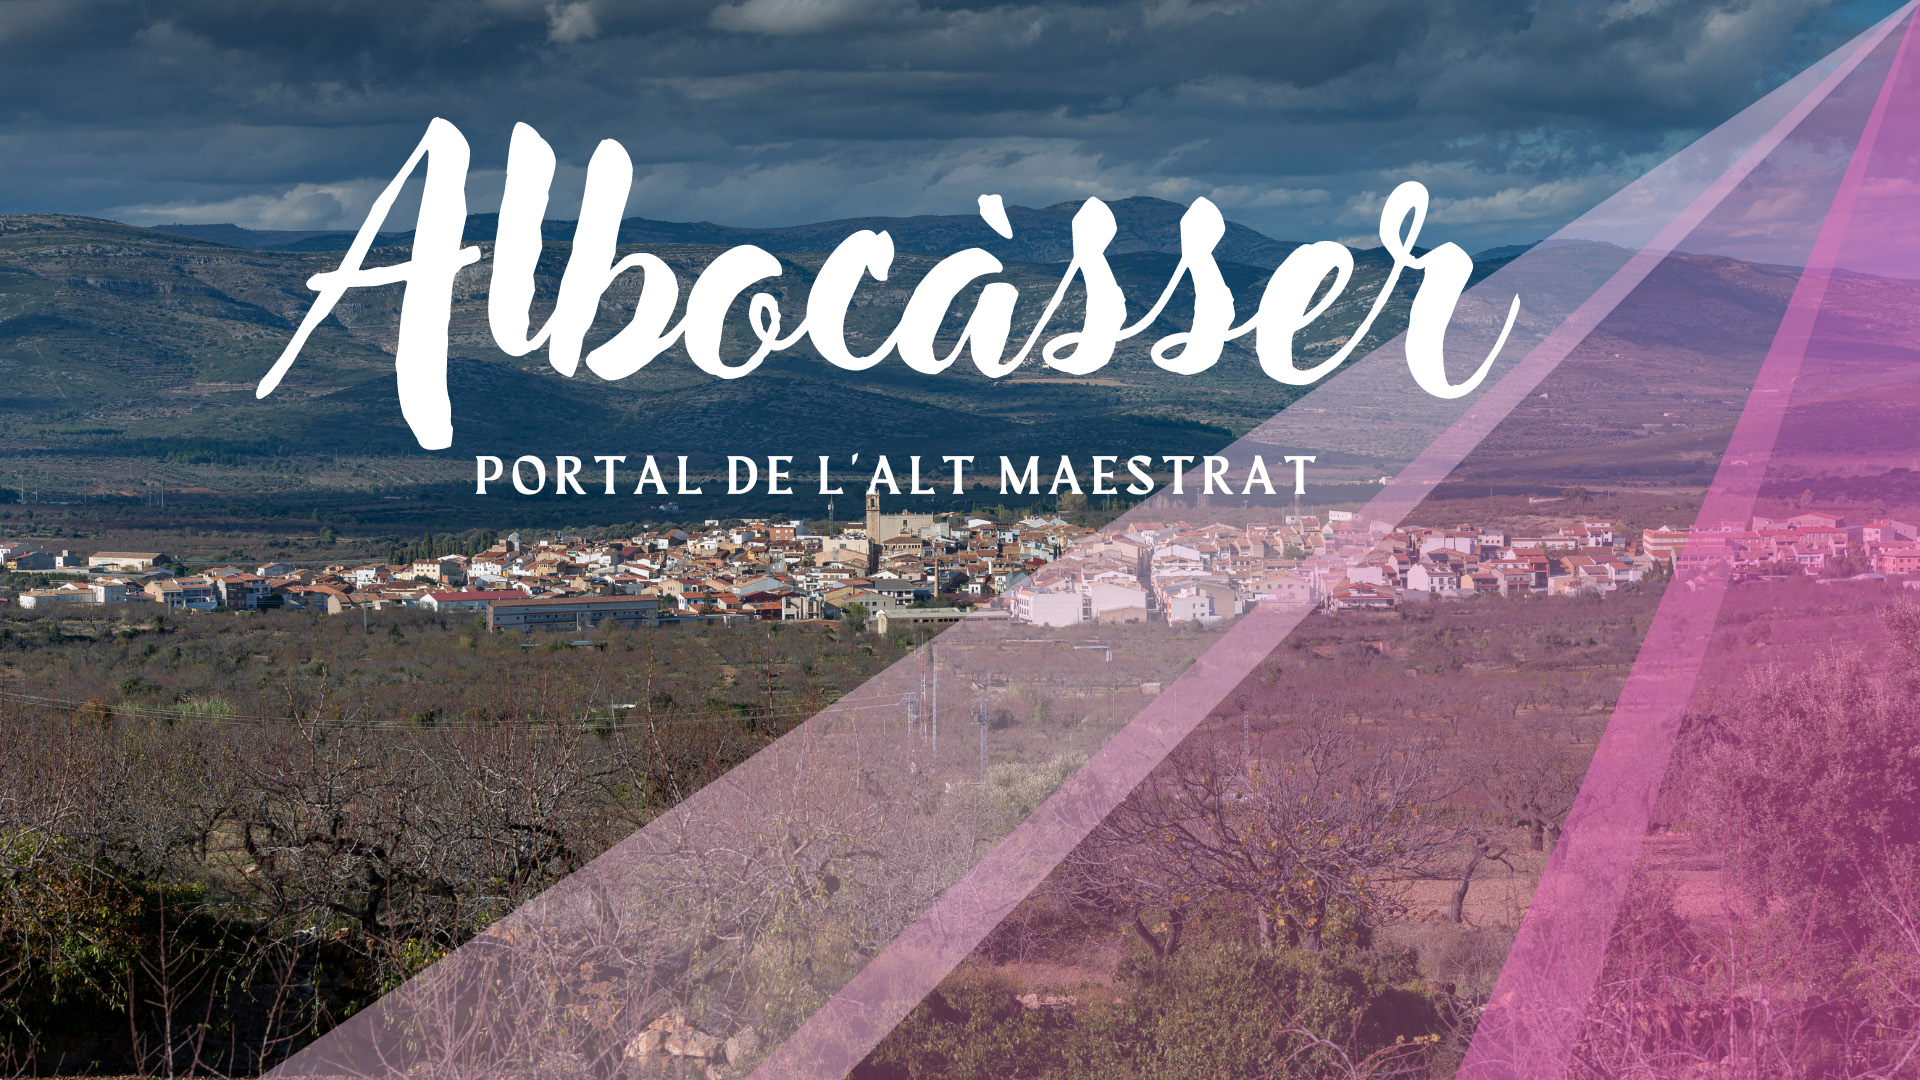 Albocasser portal de l'Alt Maestrat